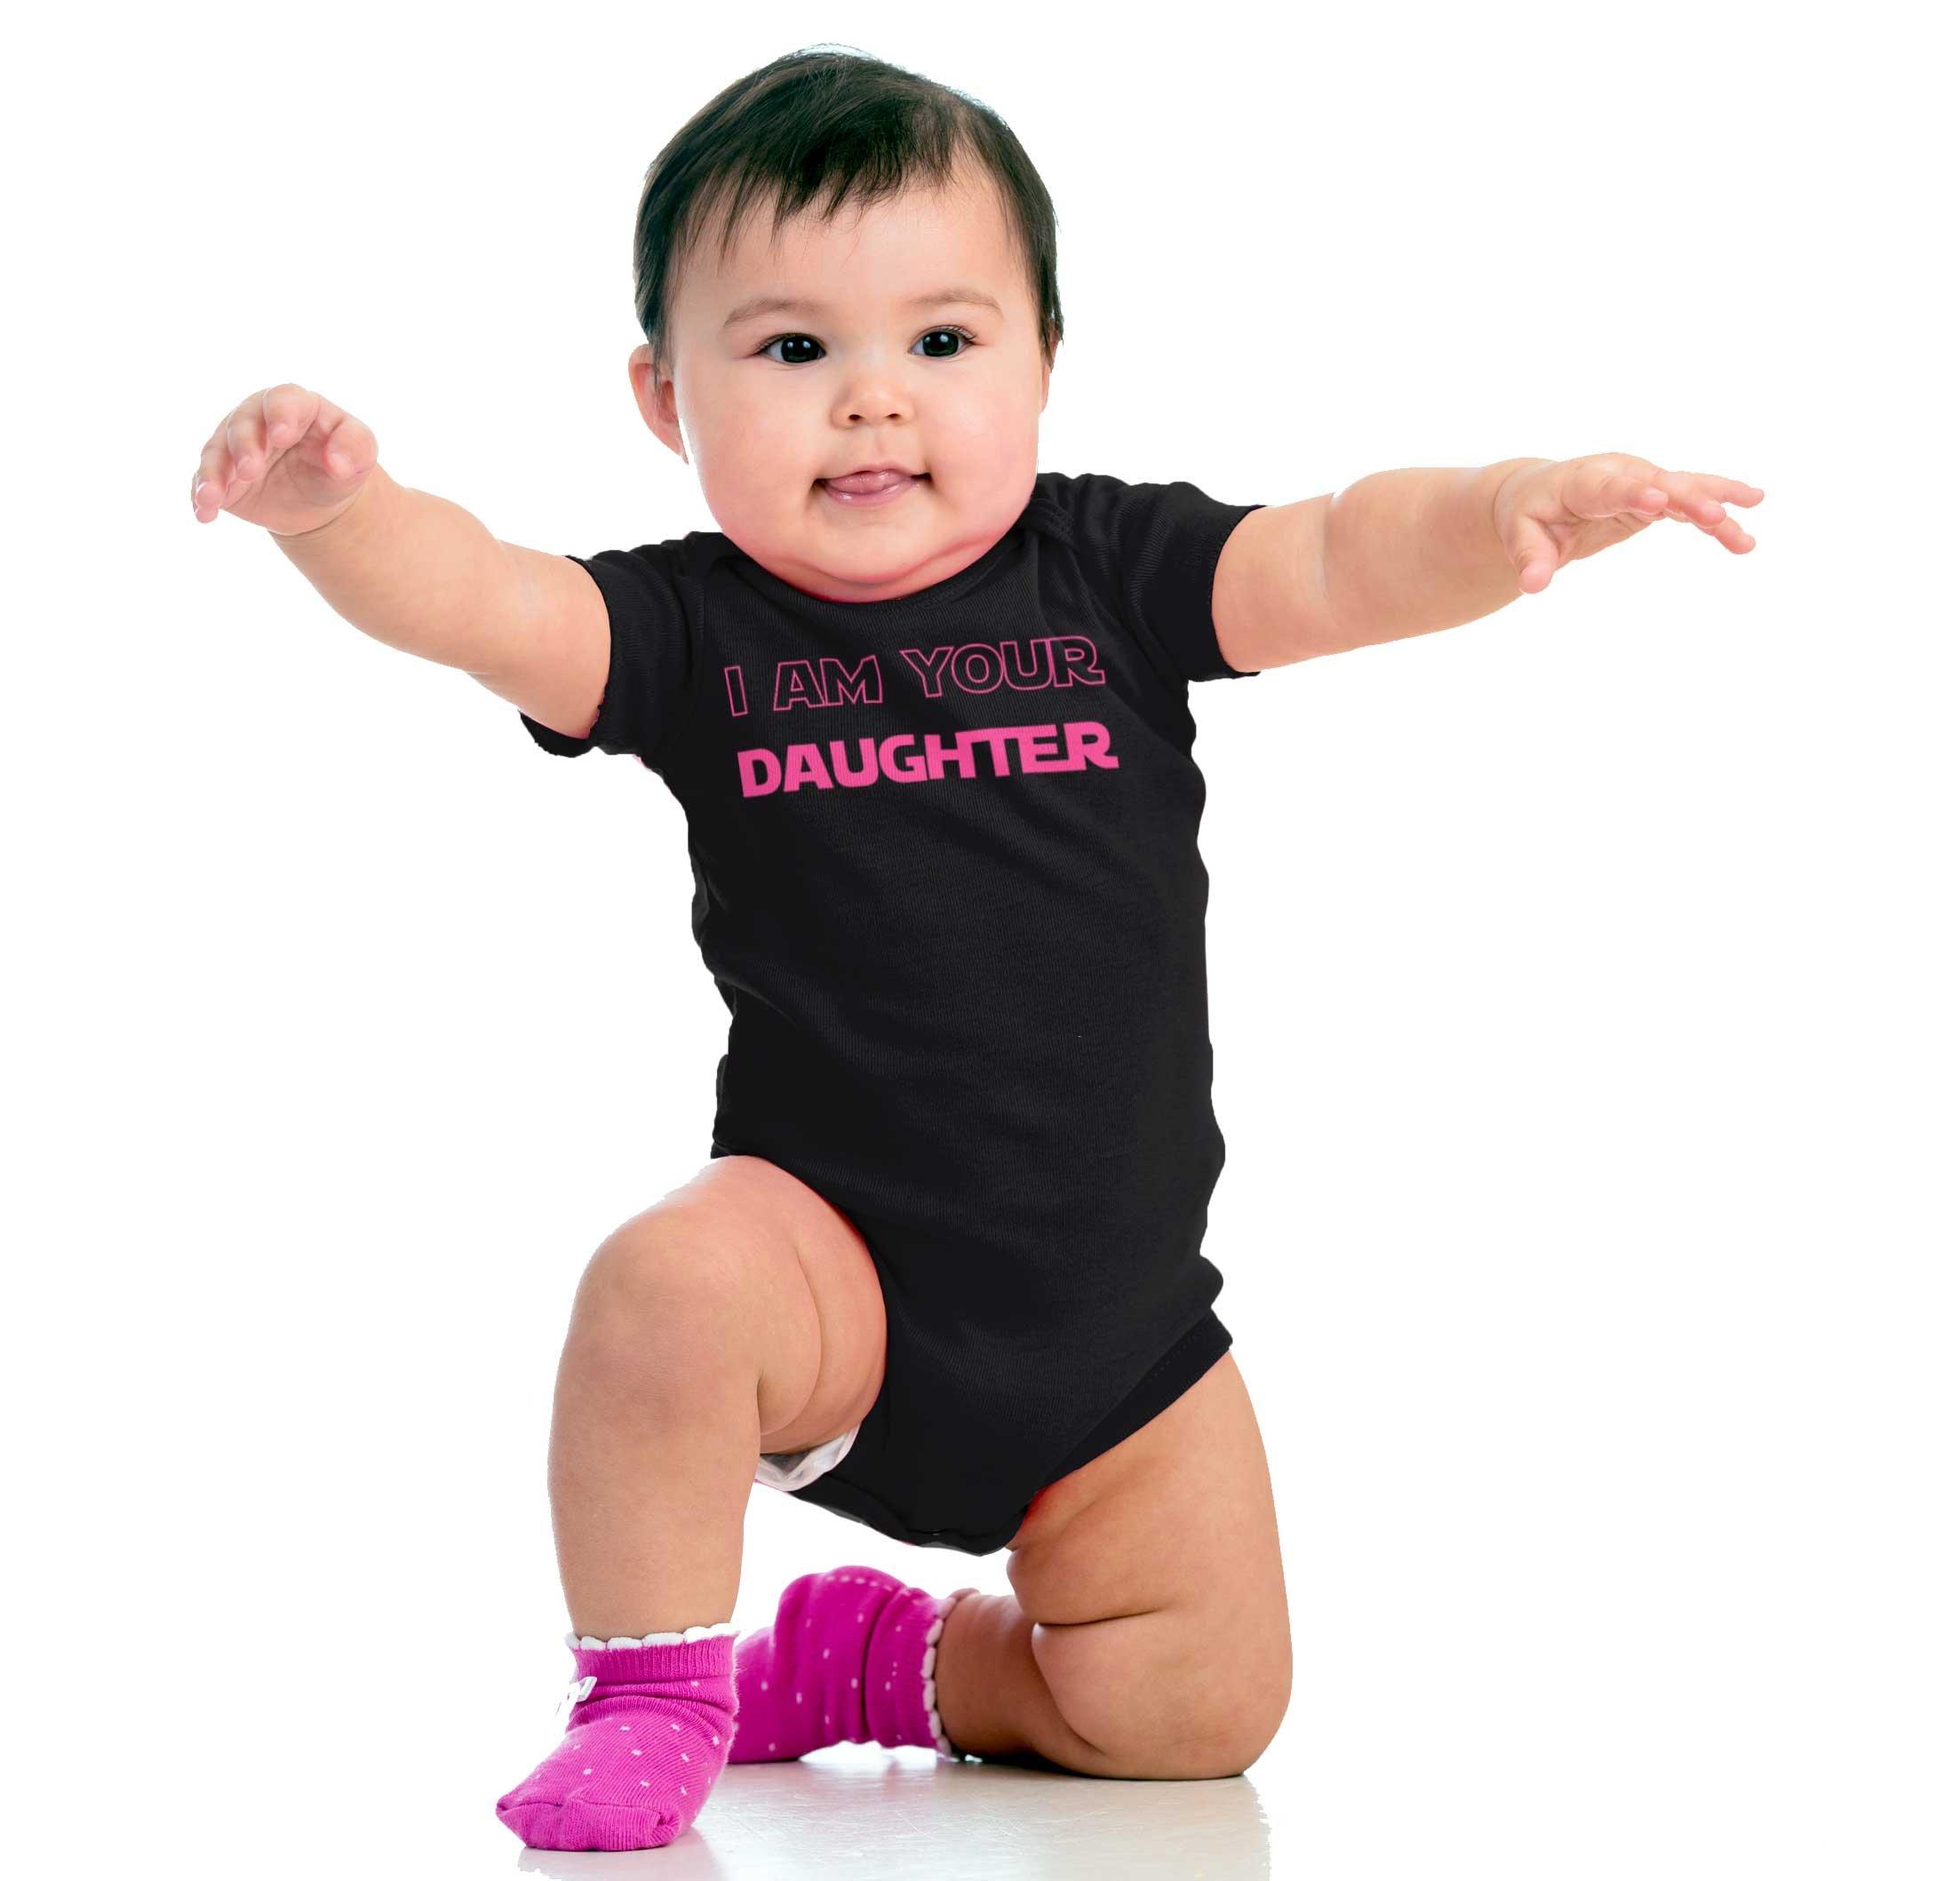 I Am Your Daughter Cute Darth Vader Star Wars Yoda Romper Bodysuit by Brisco Brands (Image #4)